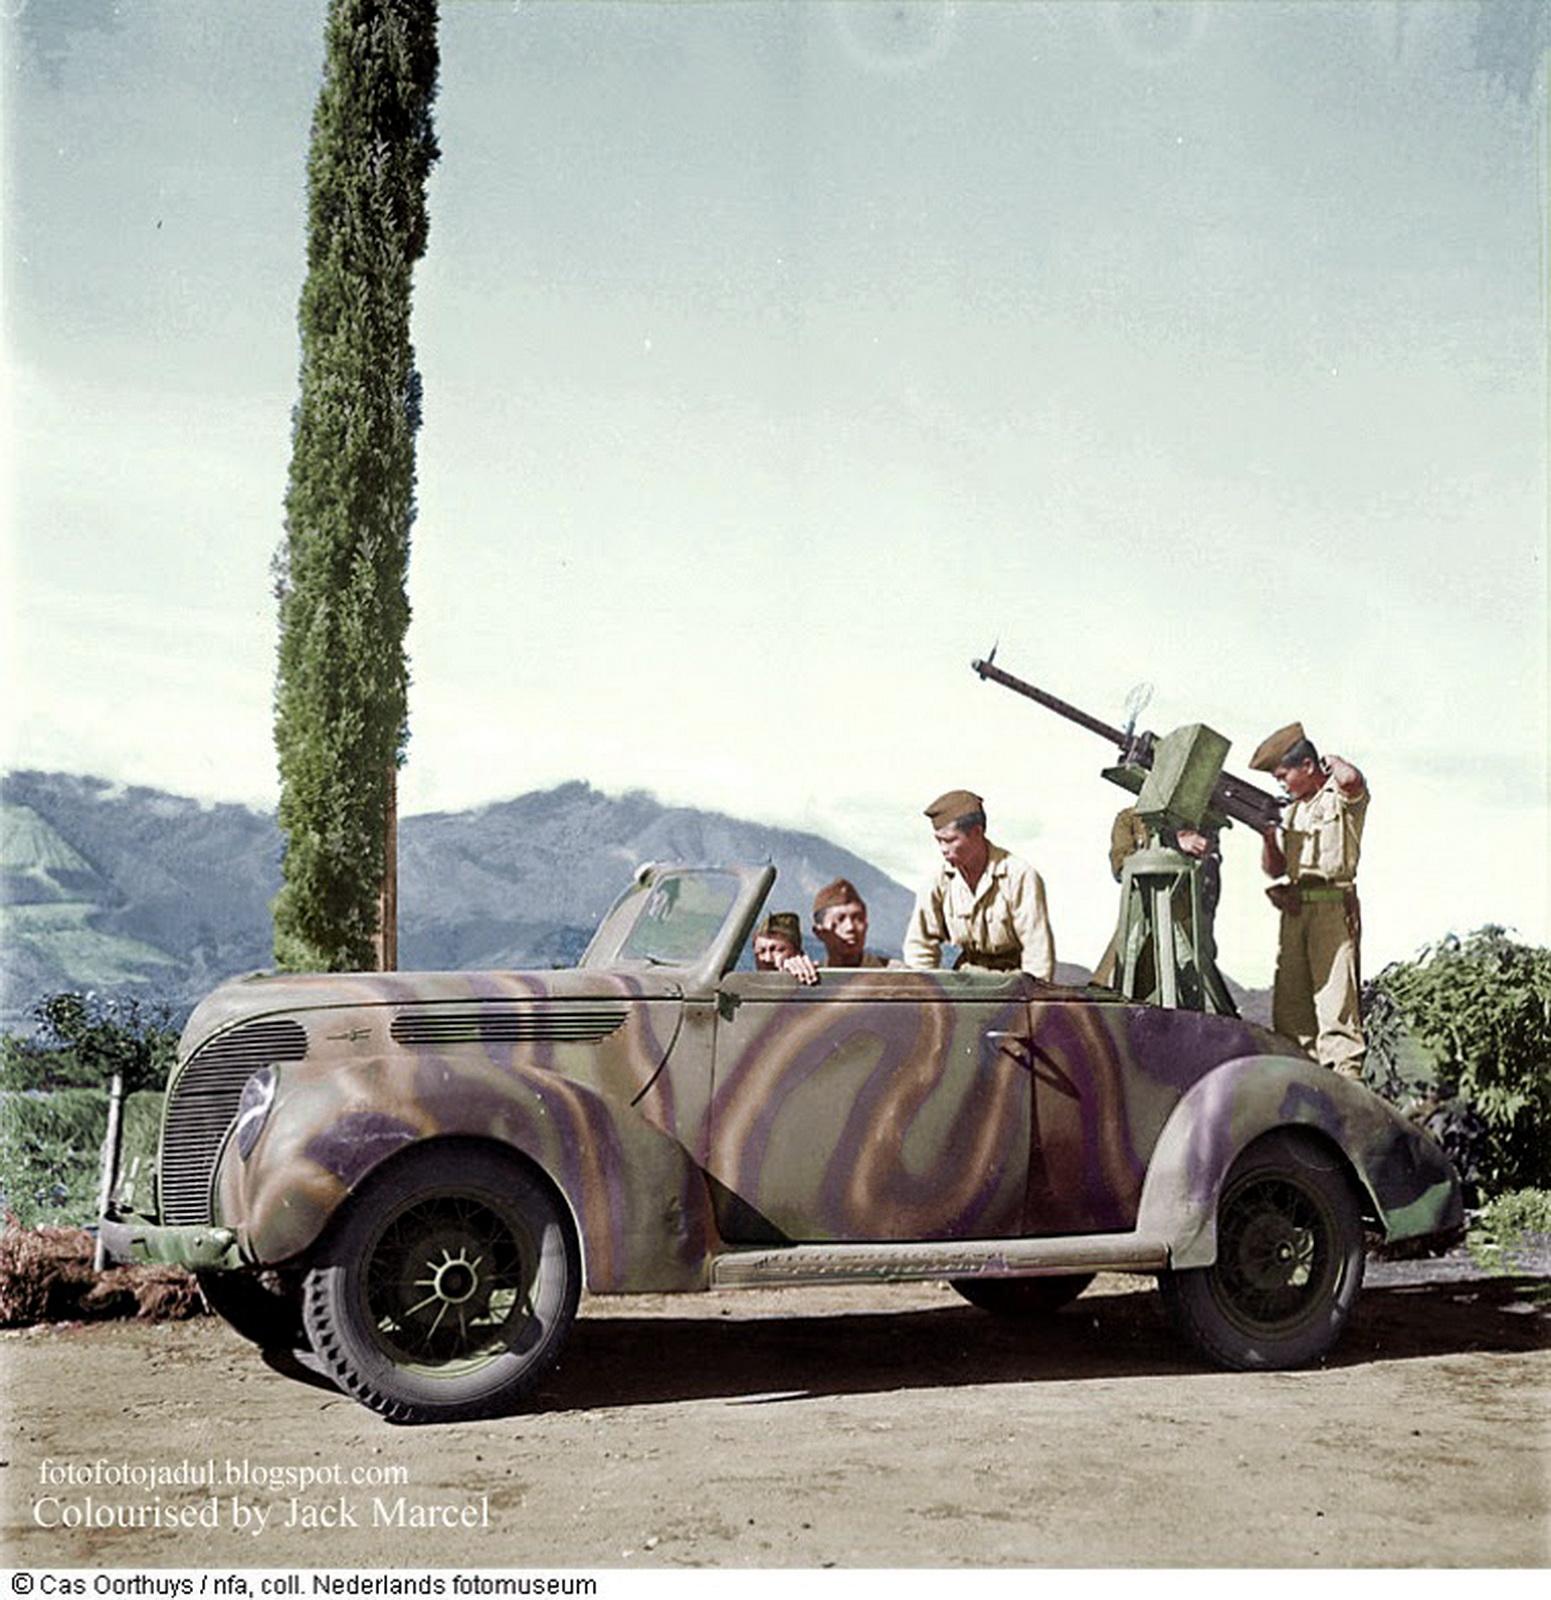 OLD INDONESIAN VEHICLES: AA Gun Mounted on an Open Passenger Car